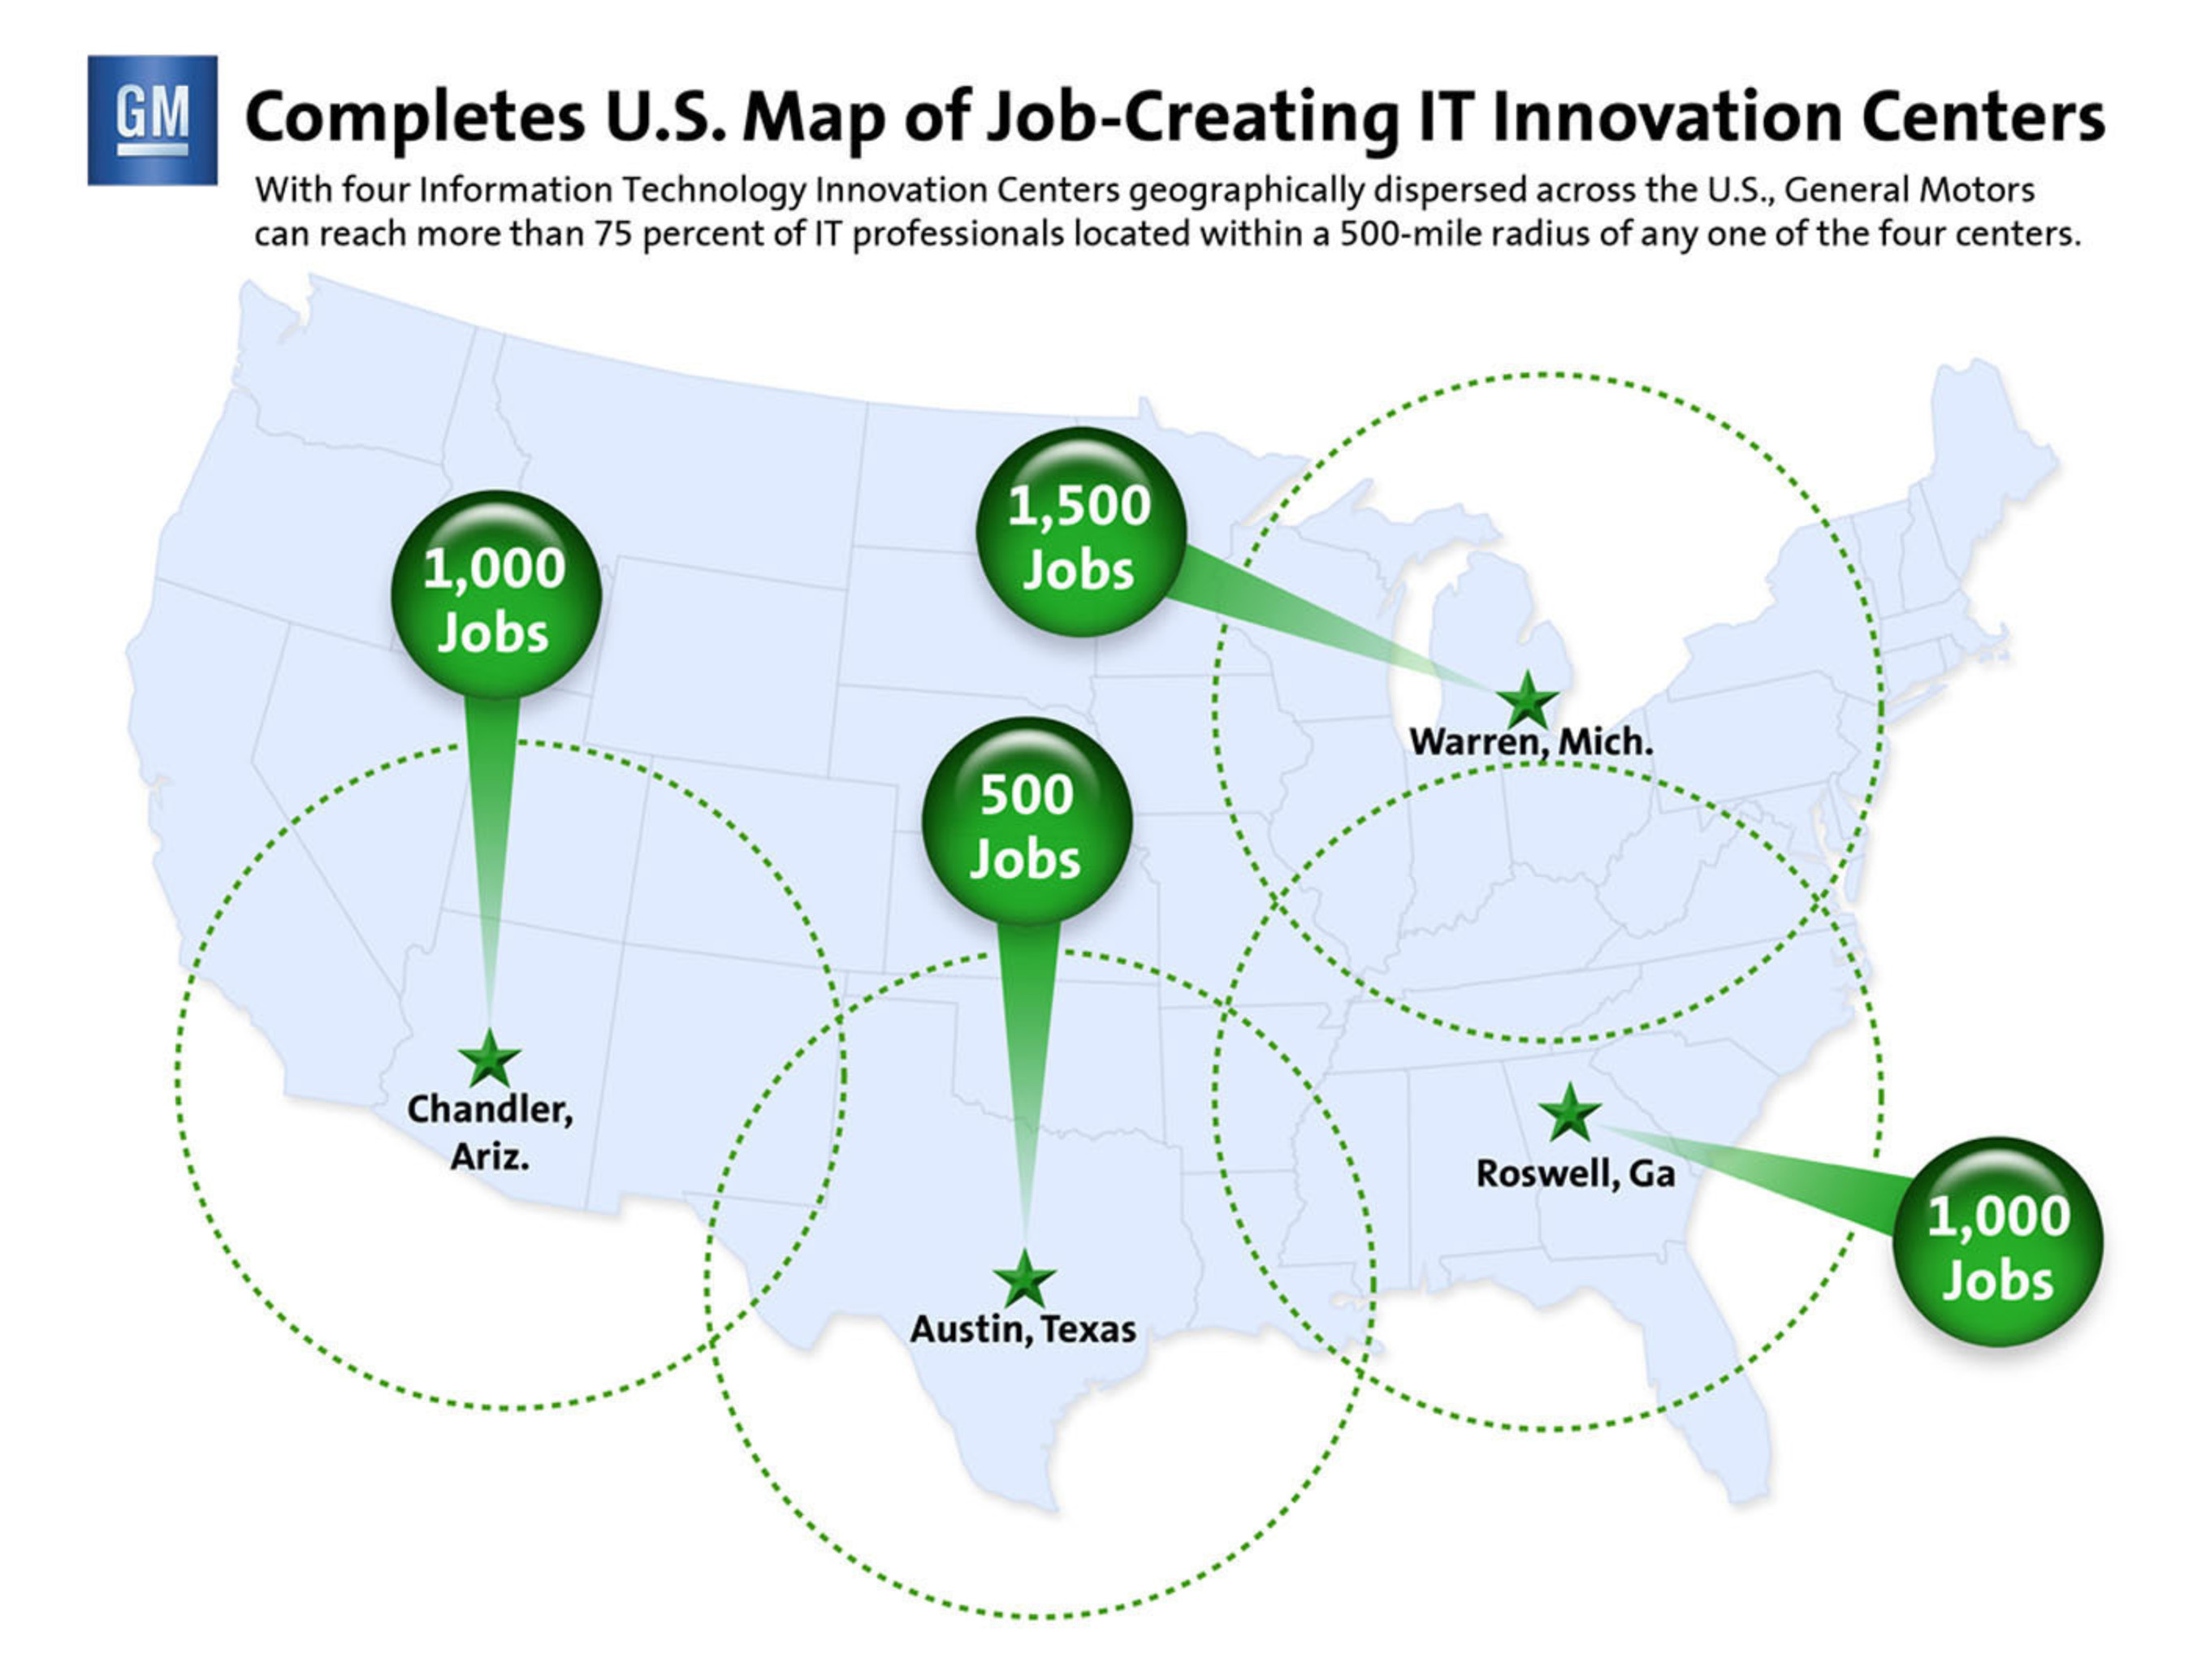 Completes U.S. Map of Job-Creating General Motors IT Innovation Centers.  (PRNewsFoto/General Motors)